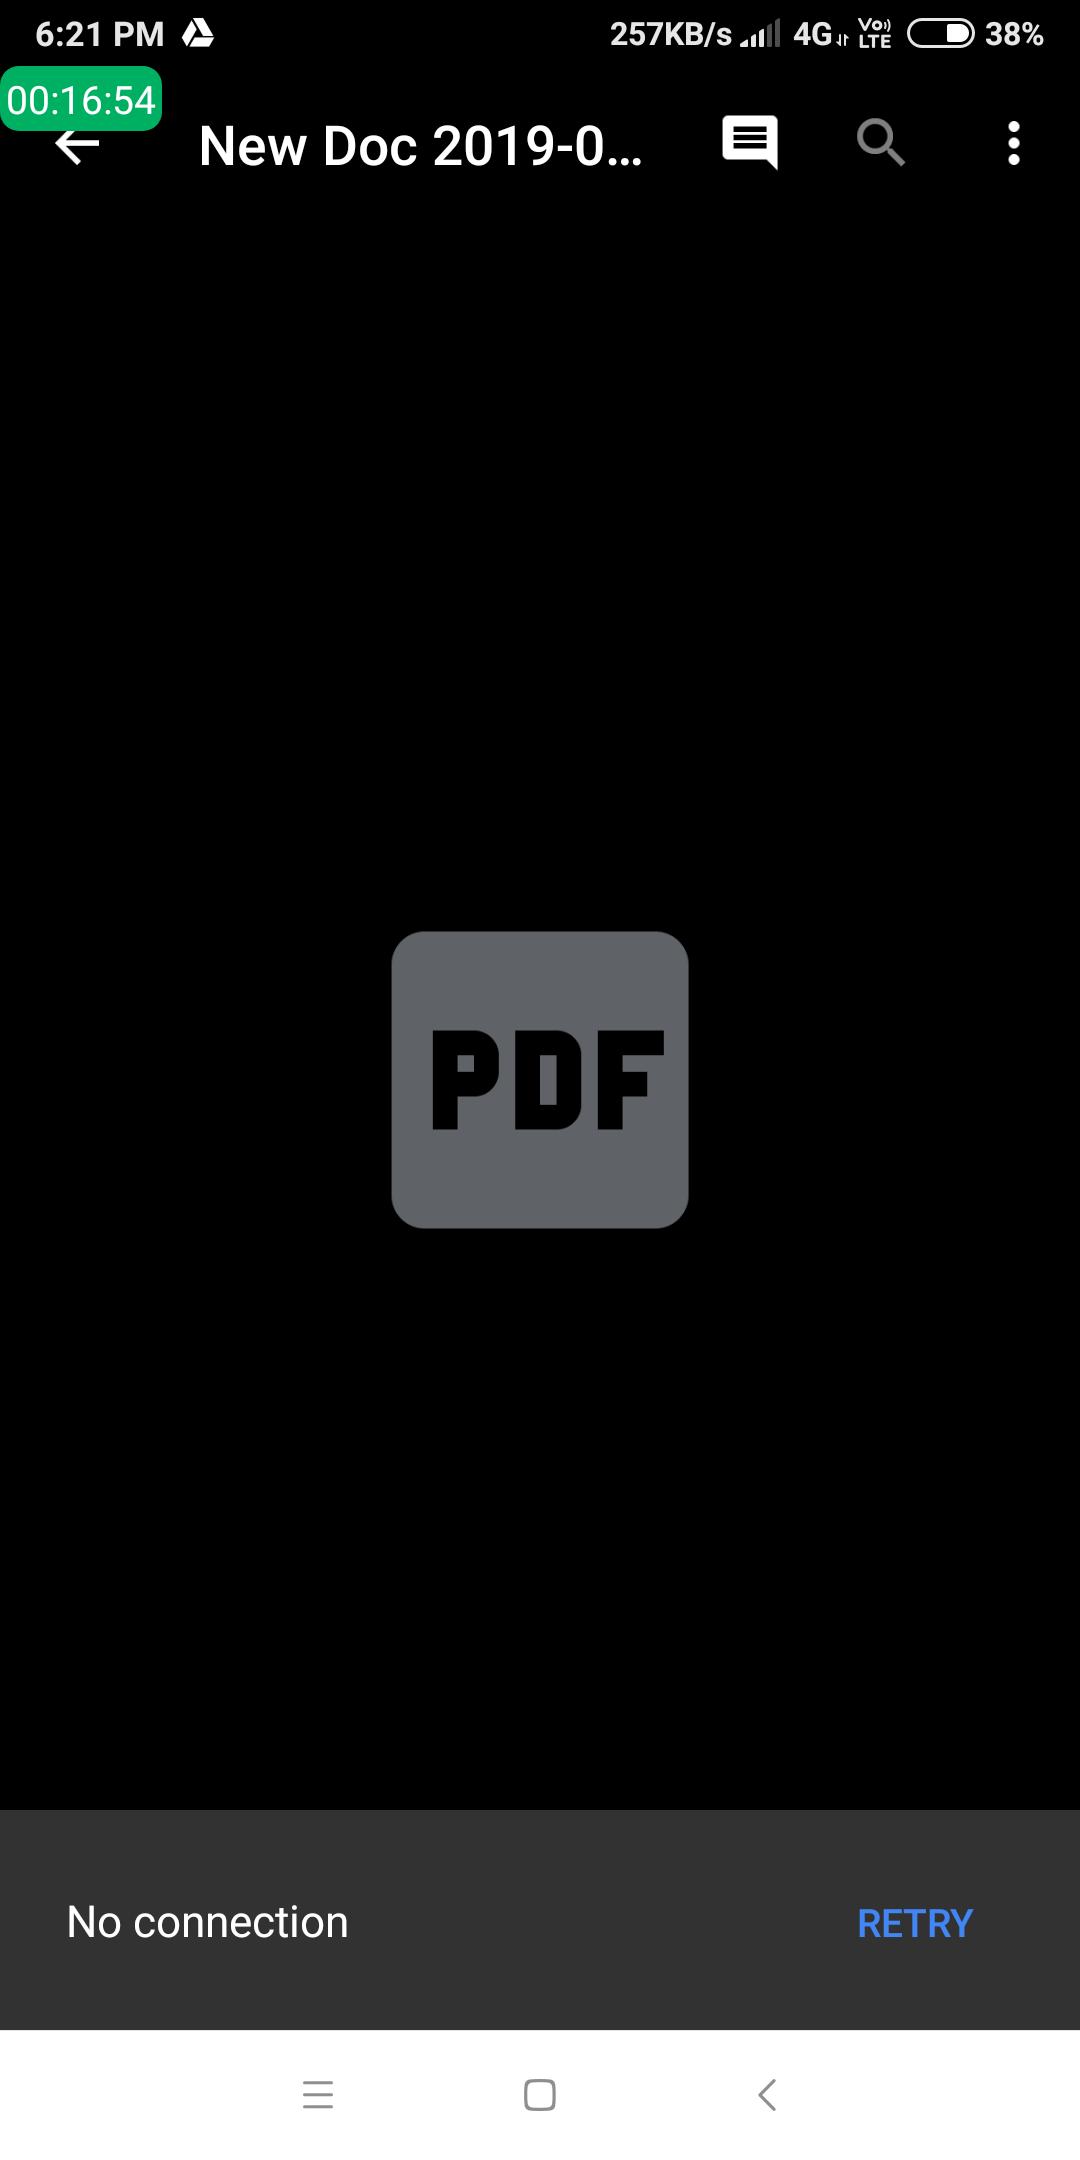 Cannot open PDF file using Google Drive app.